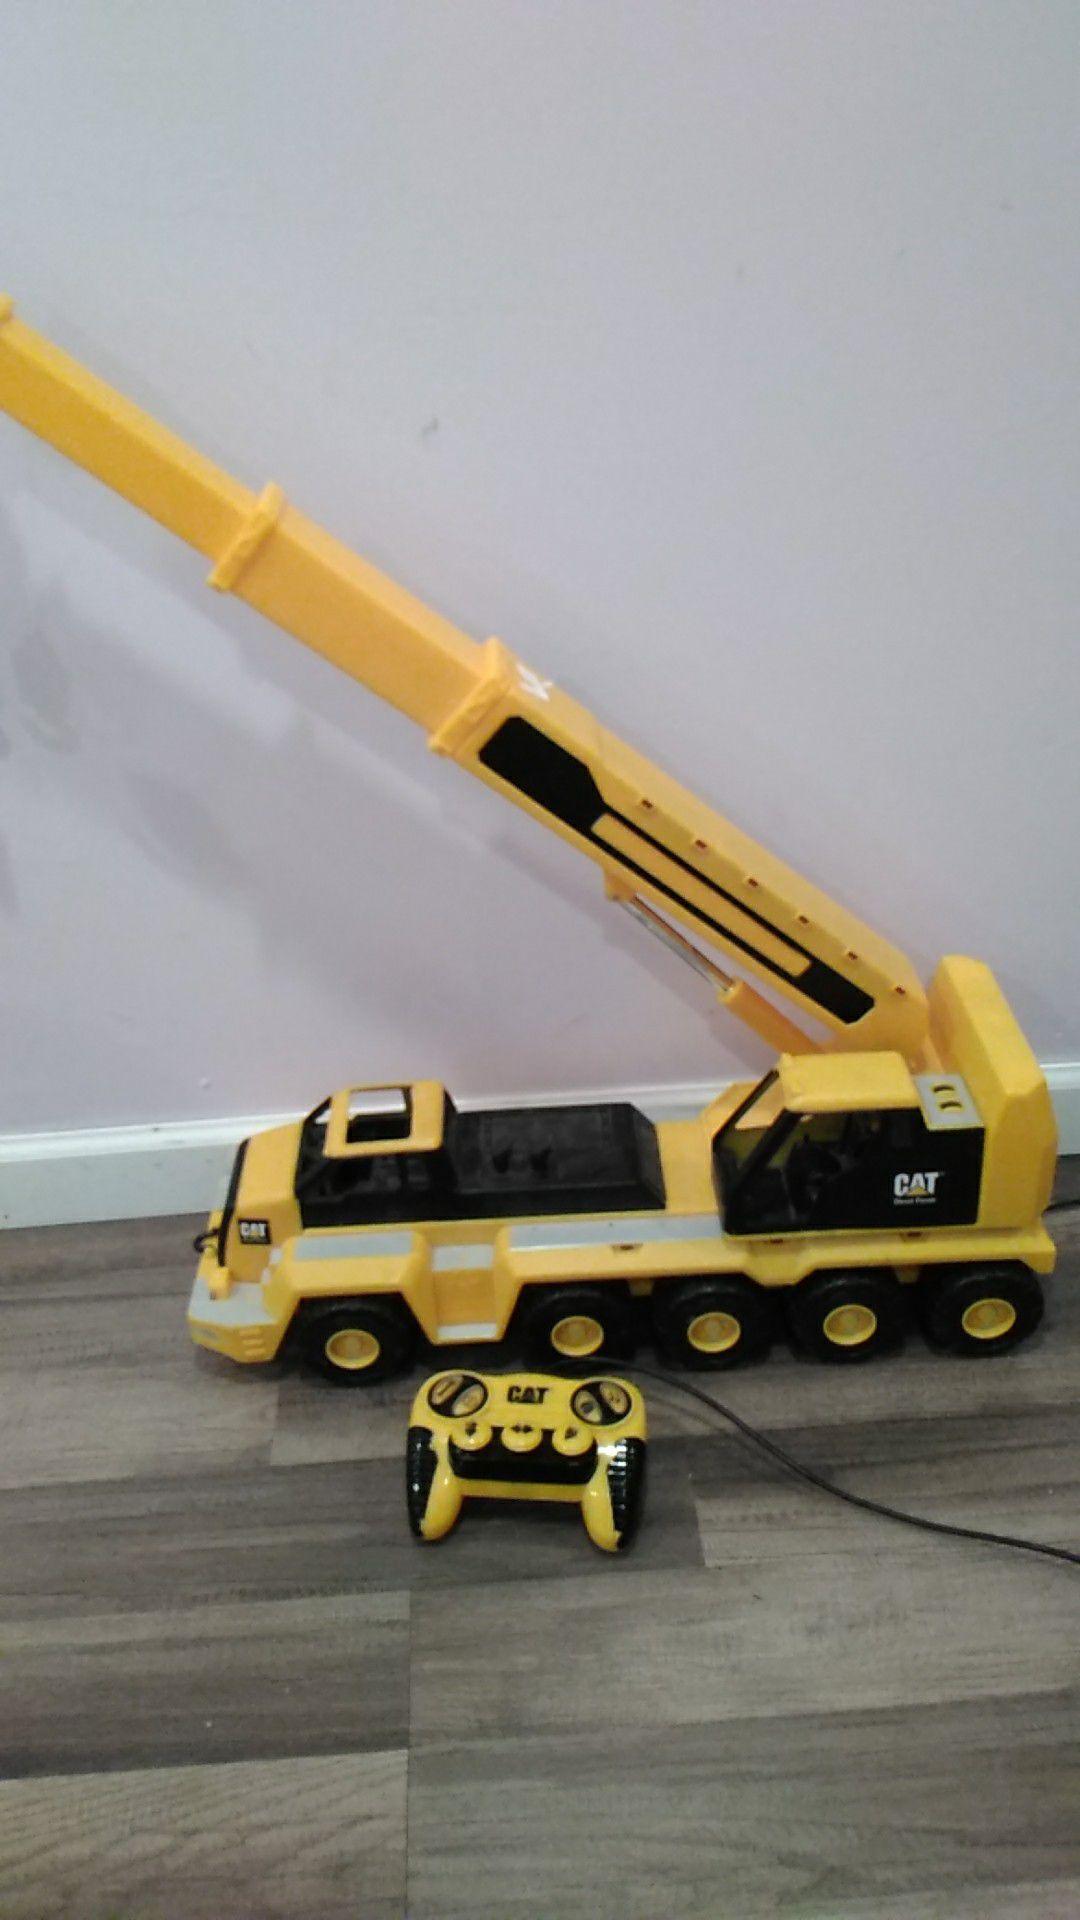 CAT crane battery operated